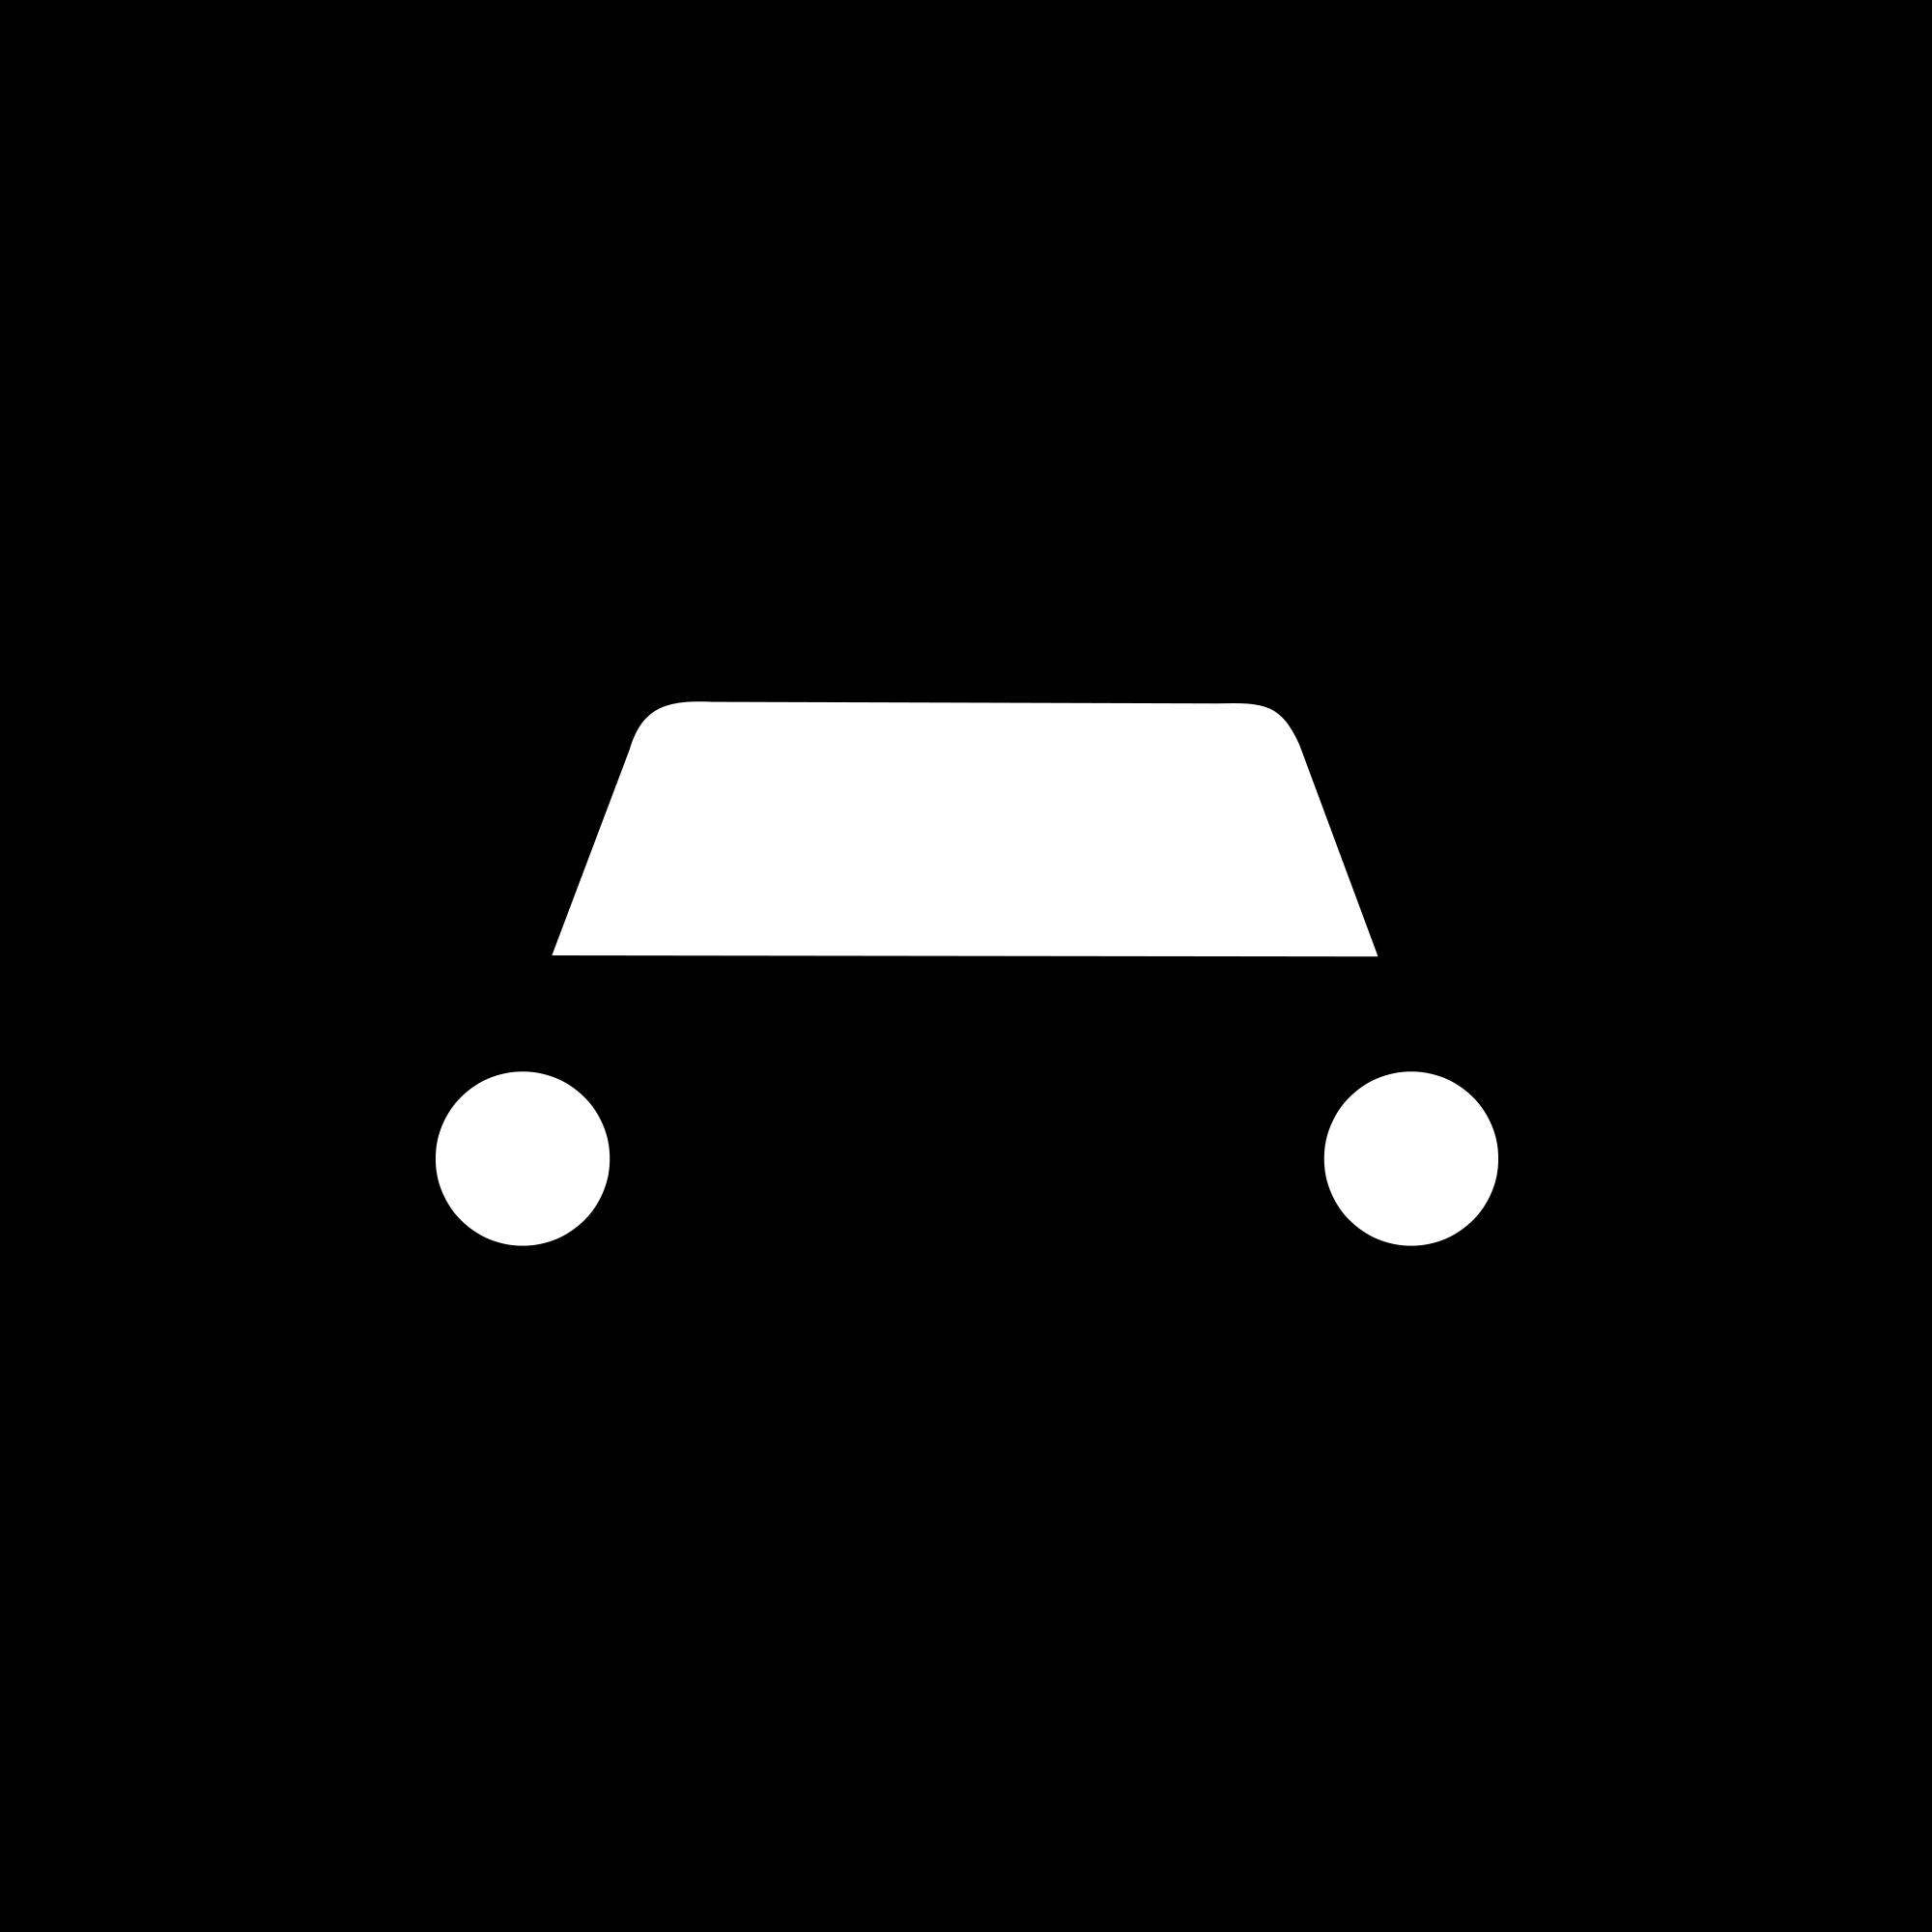 Taxi clipart transparent PNG Taxi logo download logos